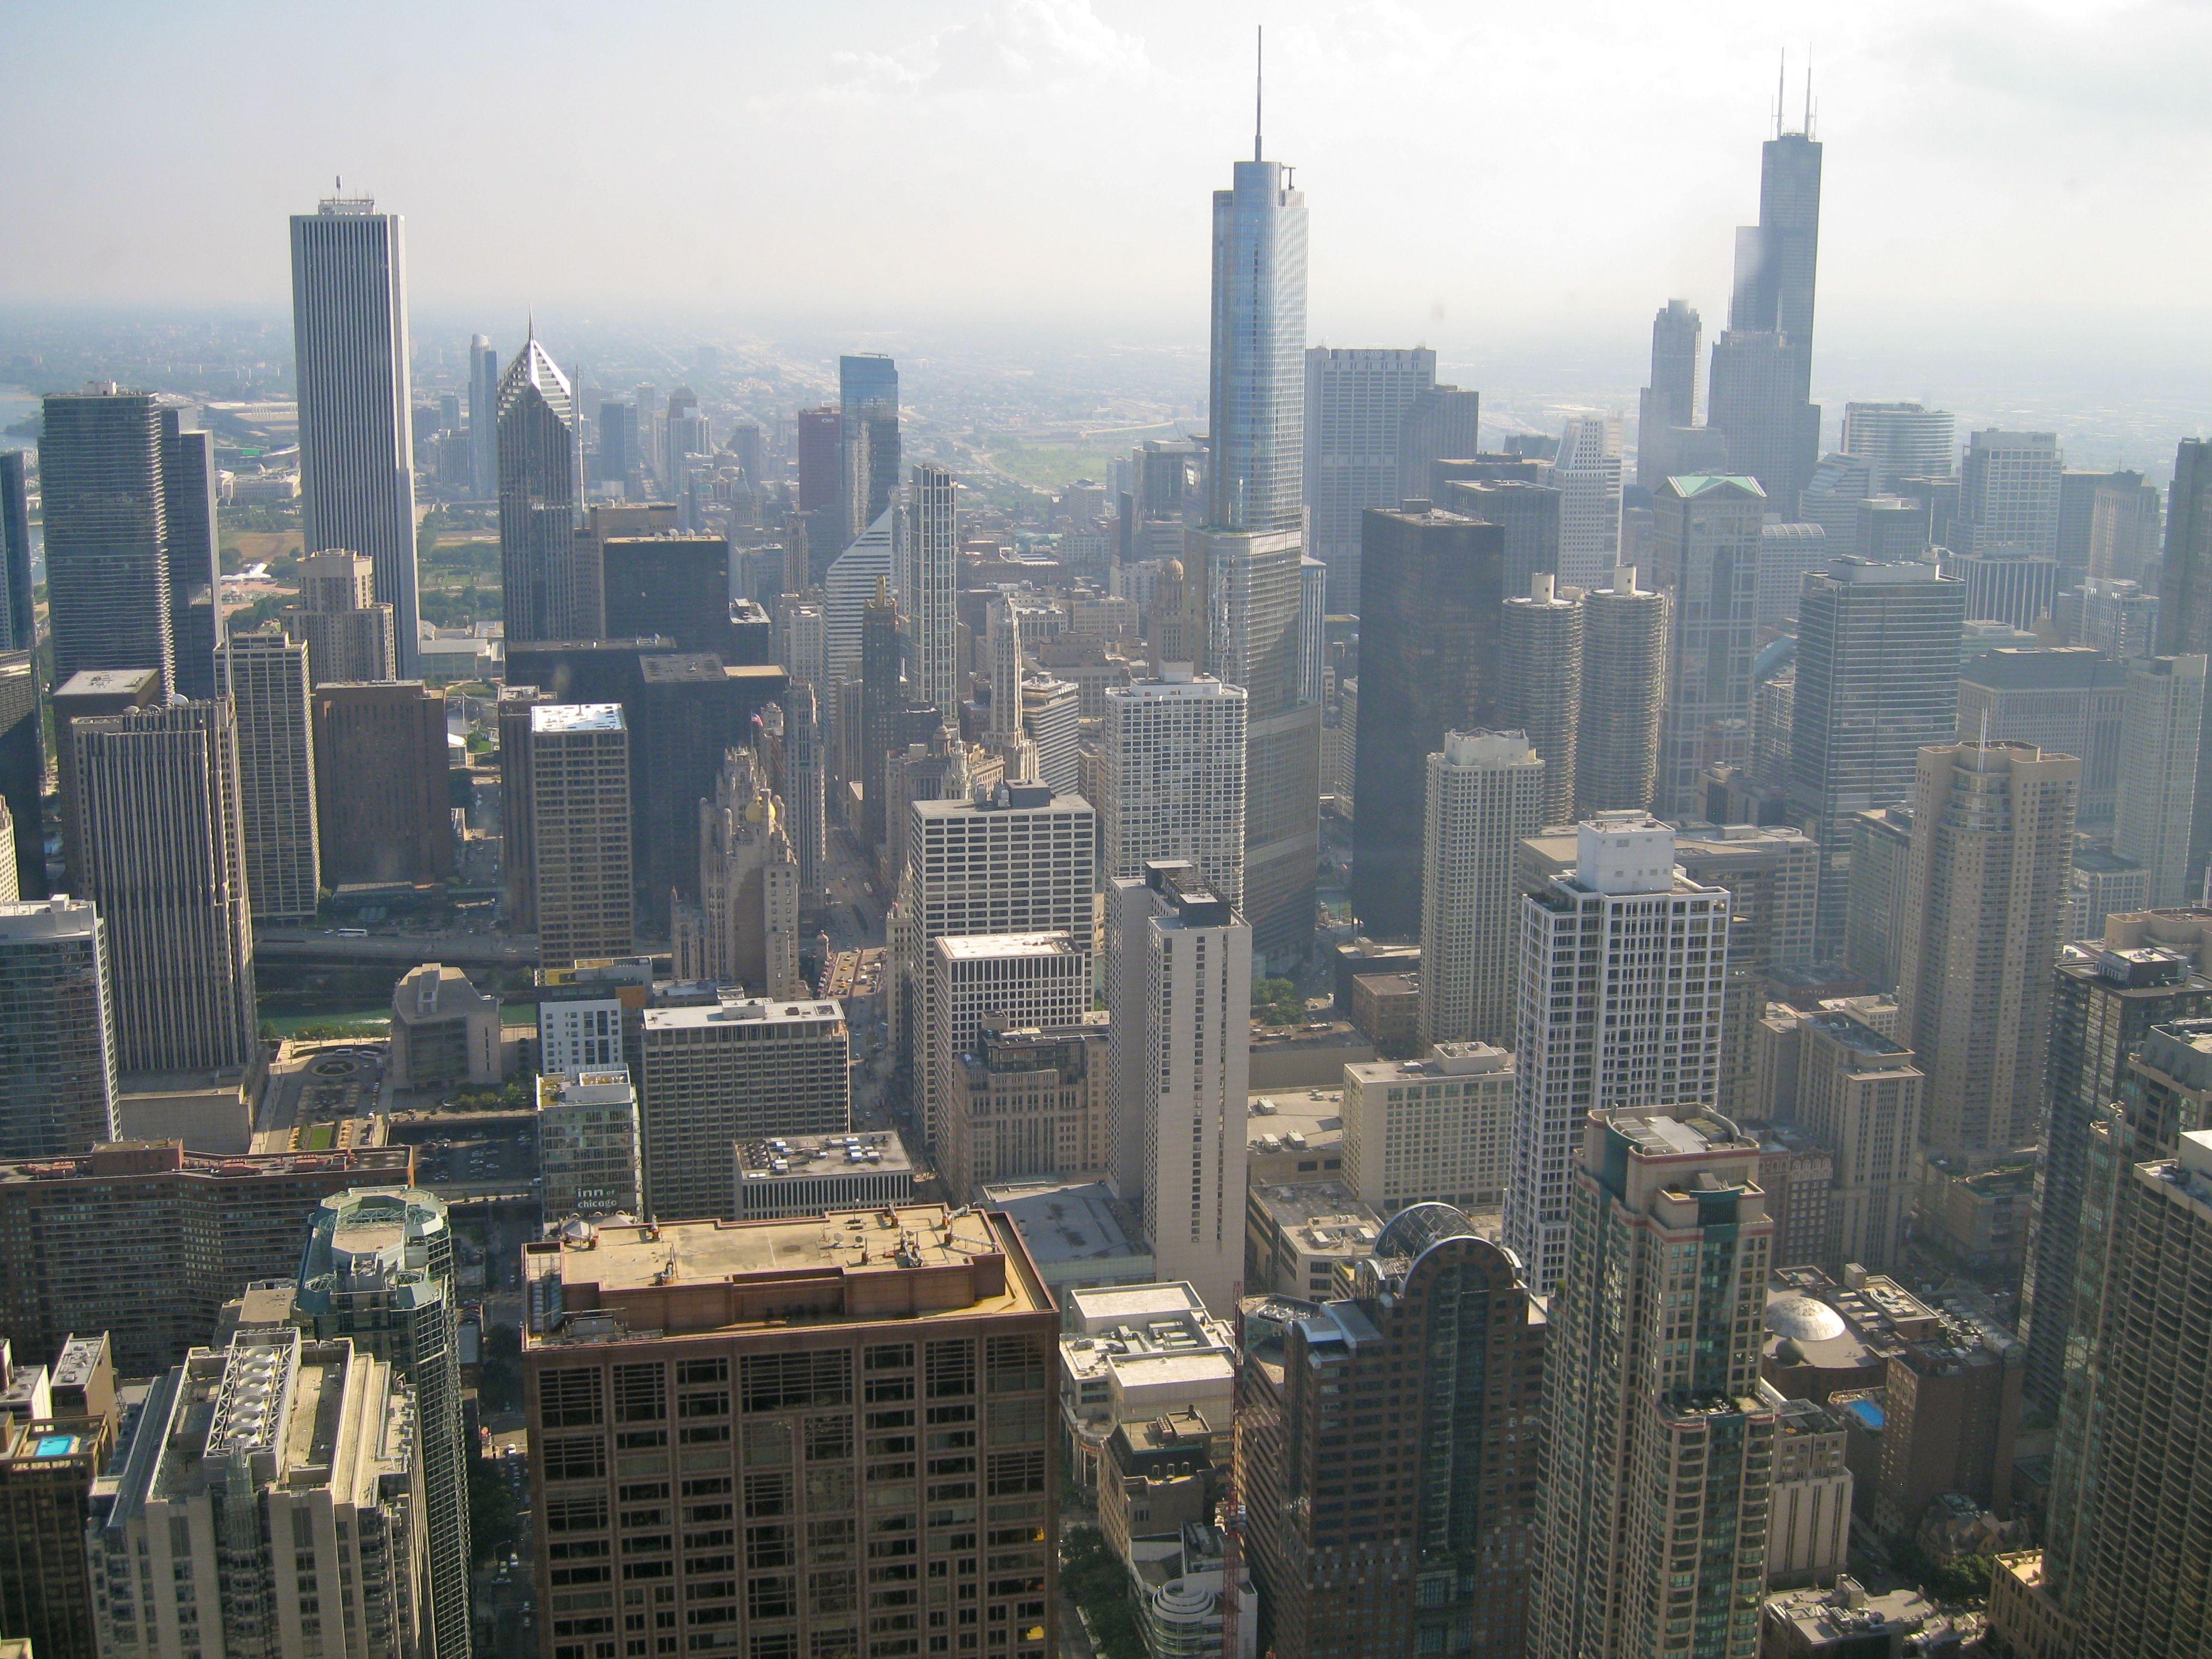 Chicago, Chicago…